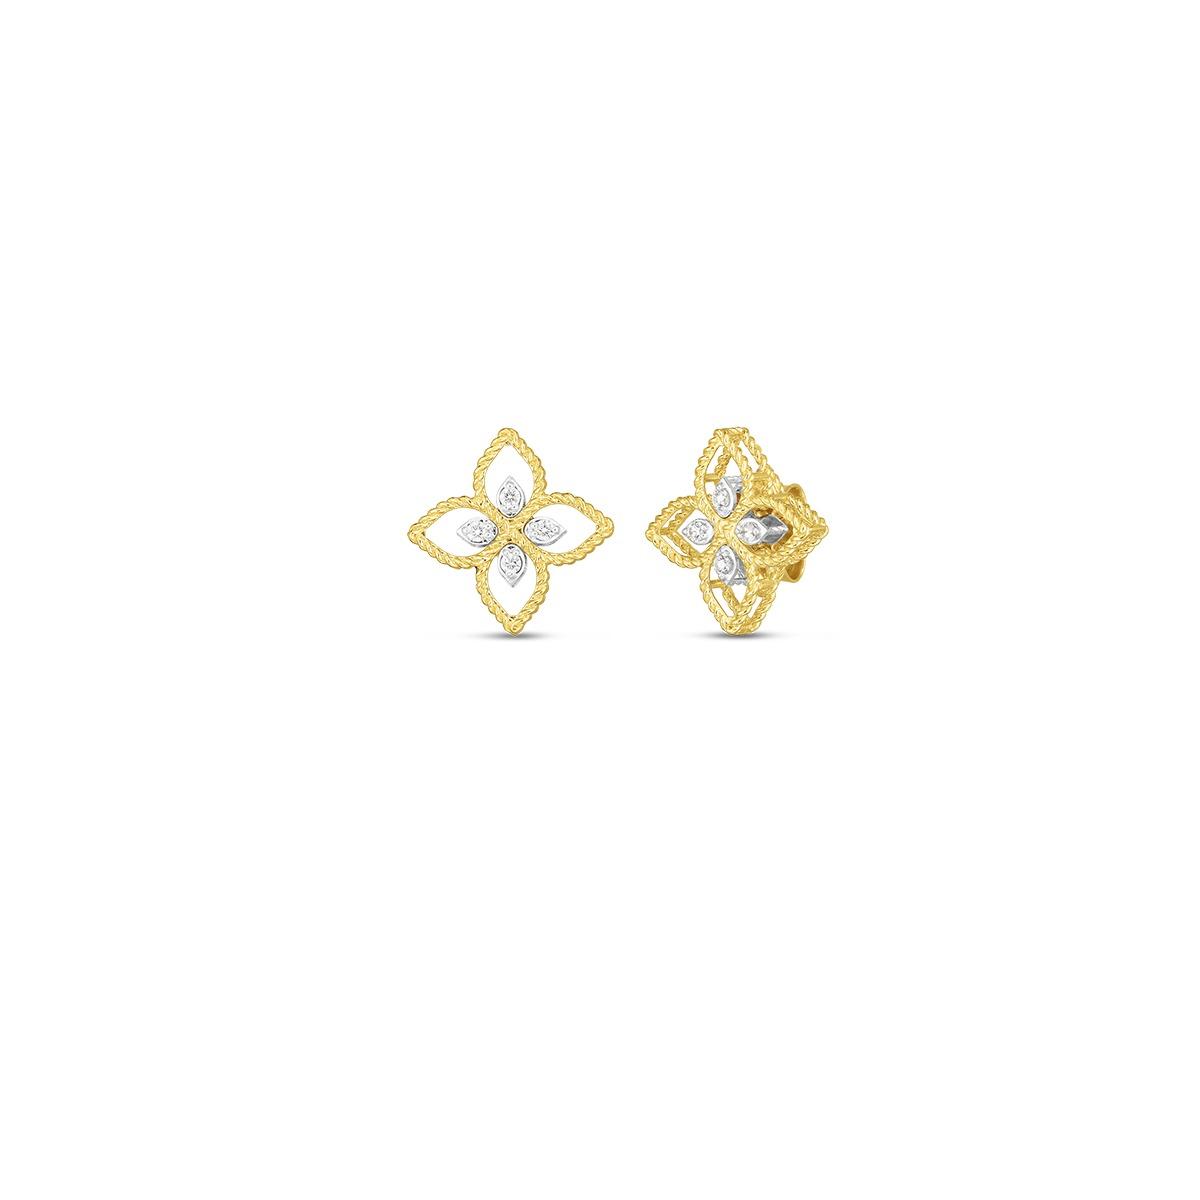 Roberto Coin 18k Yellow And White Gold Principessa Small Diamond Stud Earrings Little Treasury